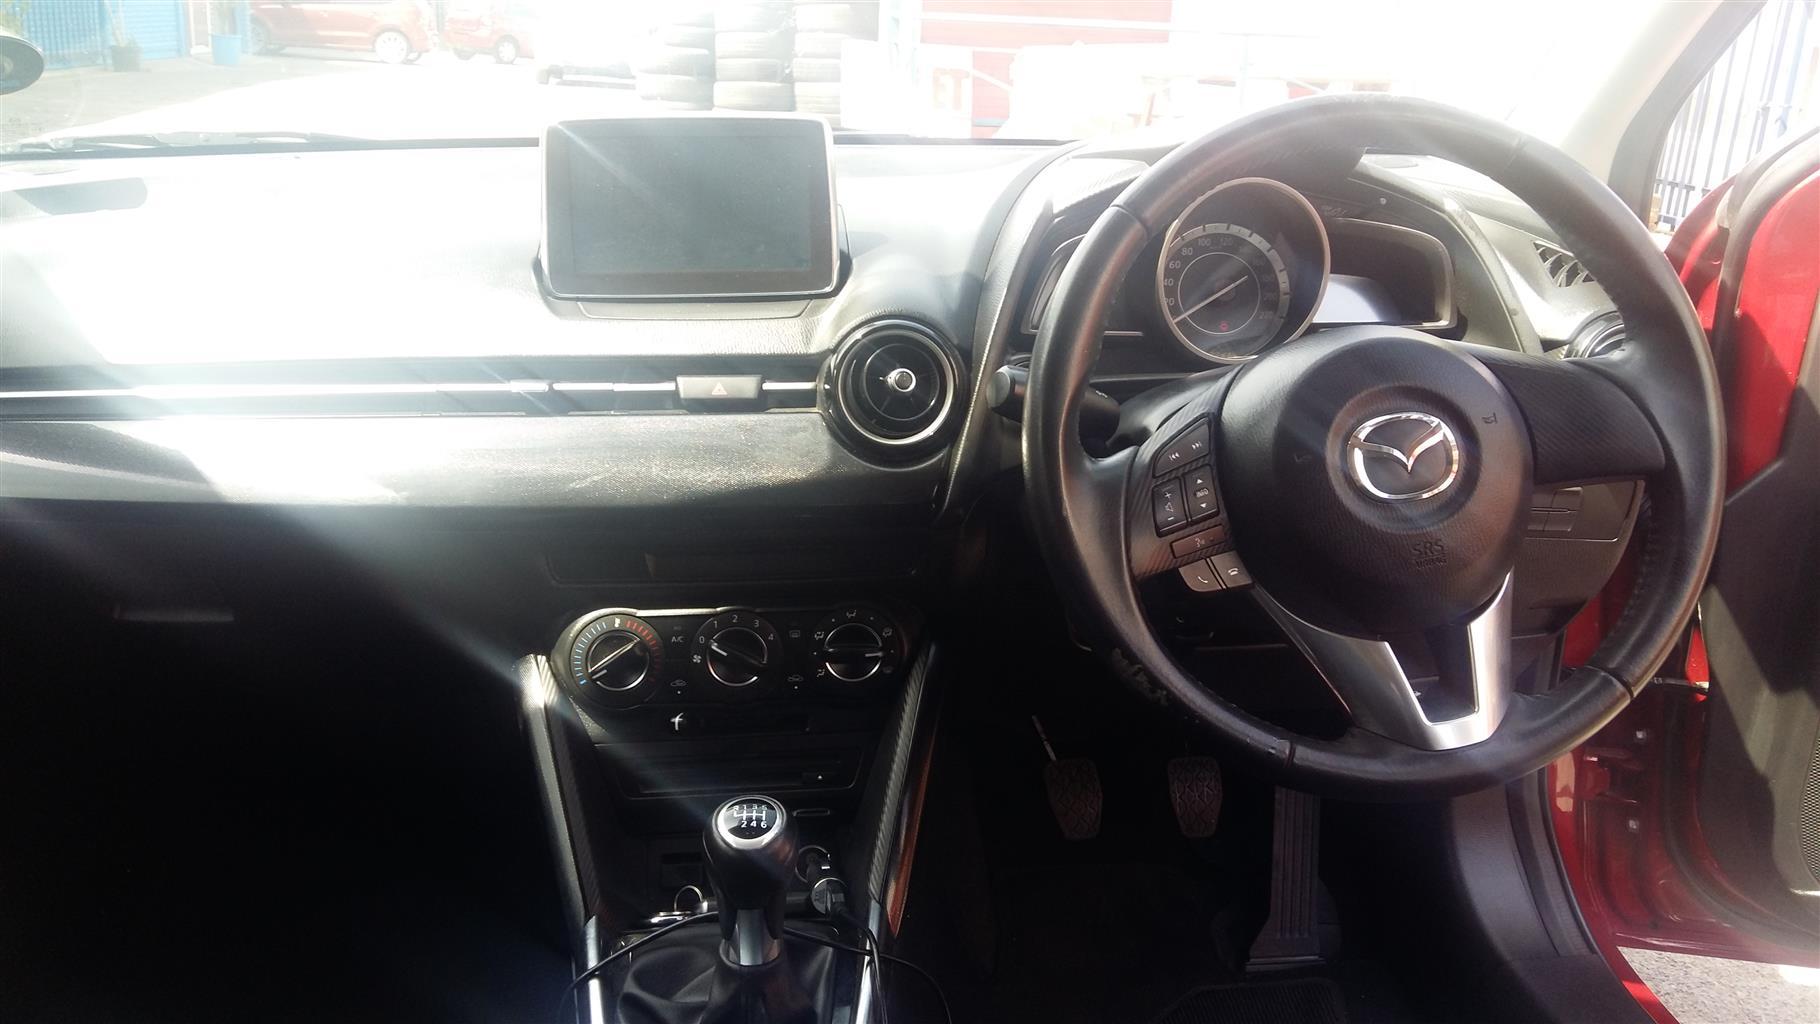 2017 Mazda 2 Mazda hatch 1.3 Active